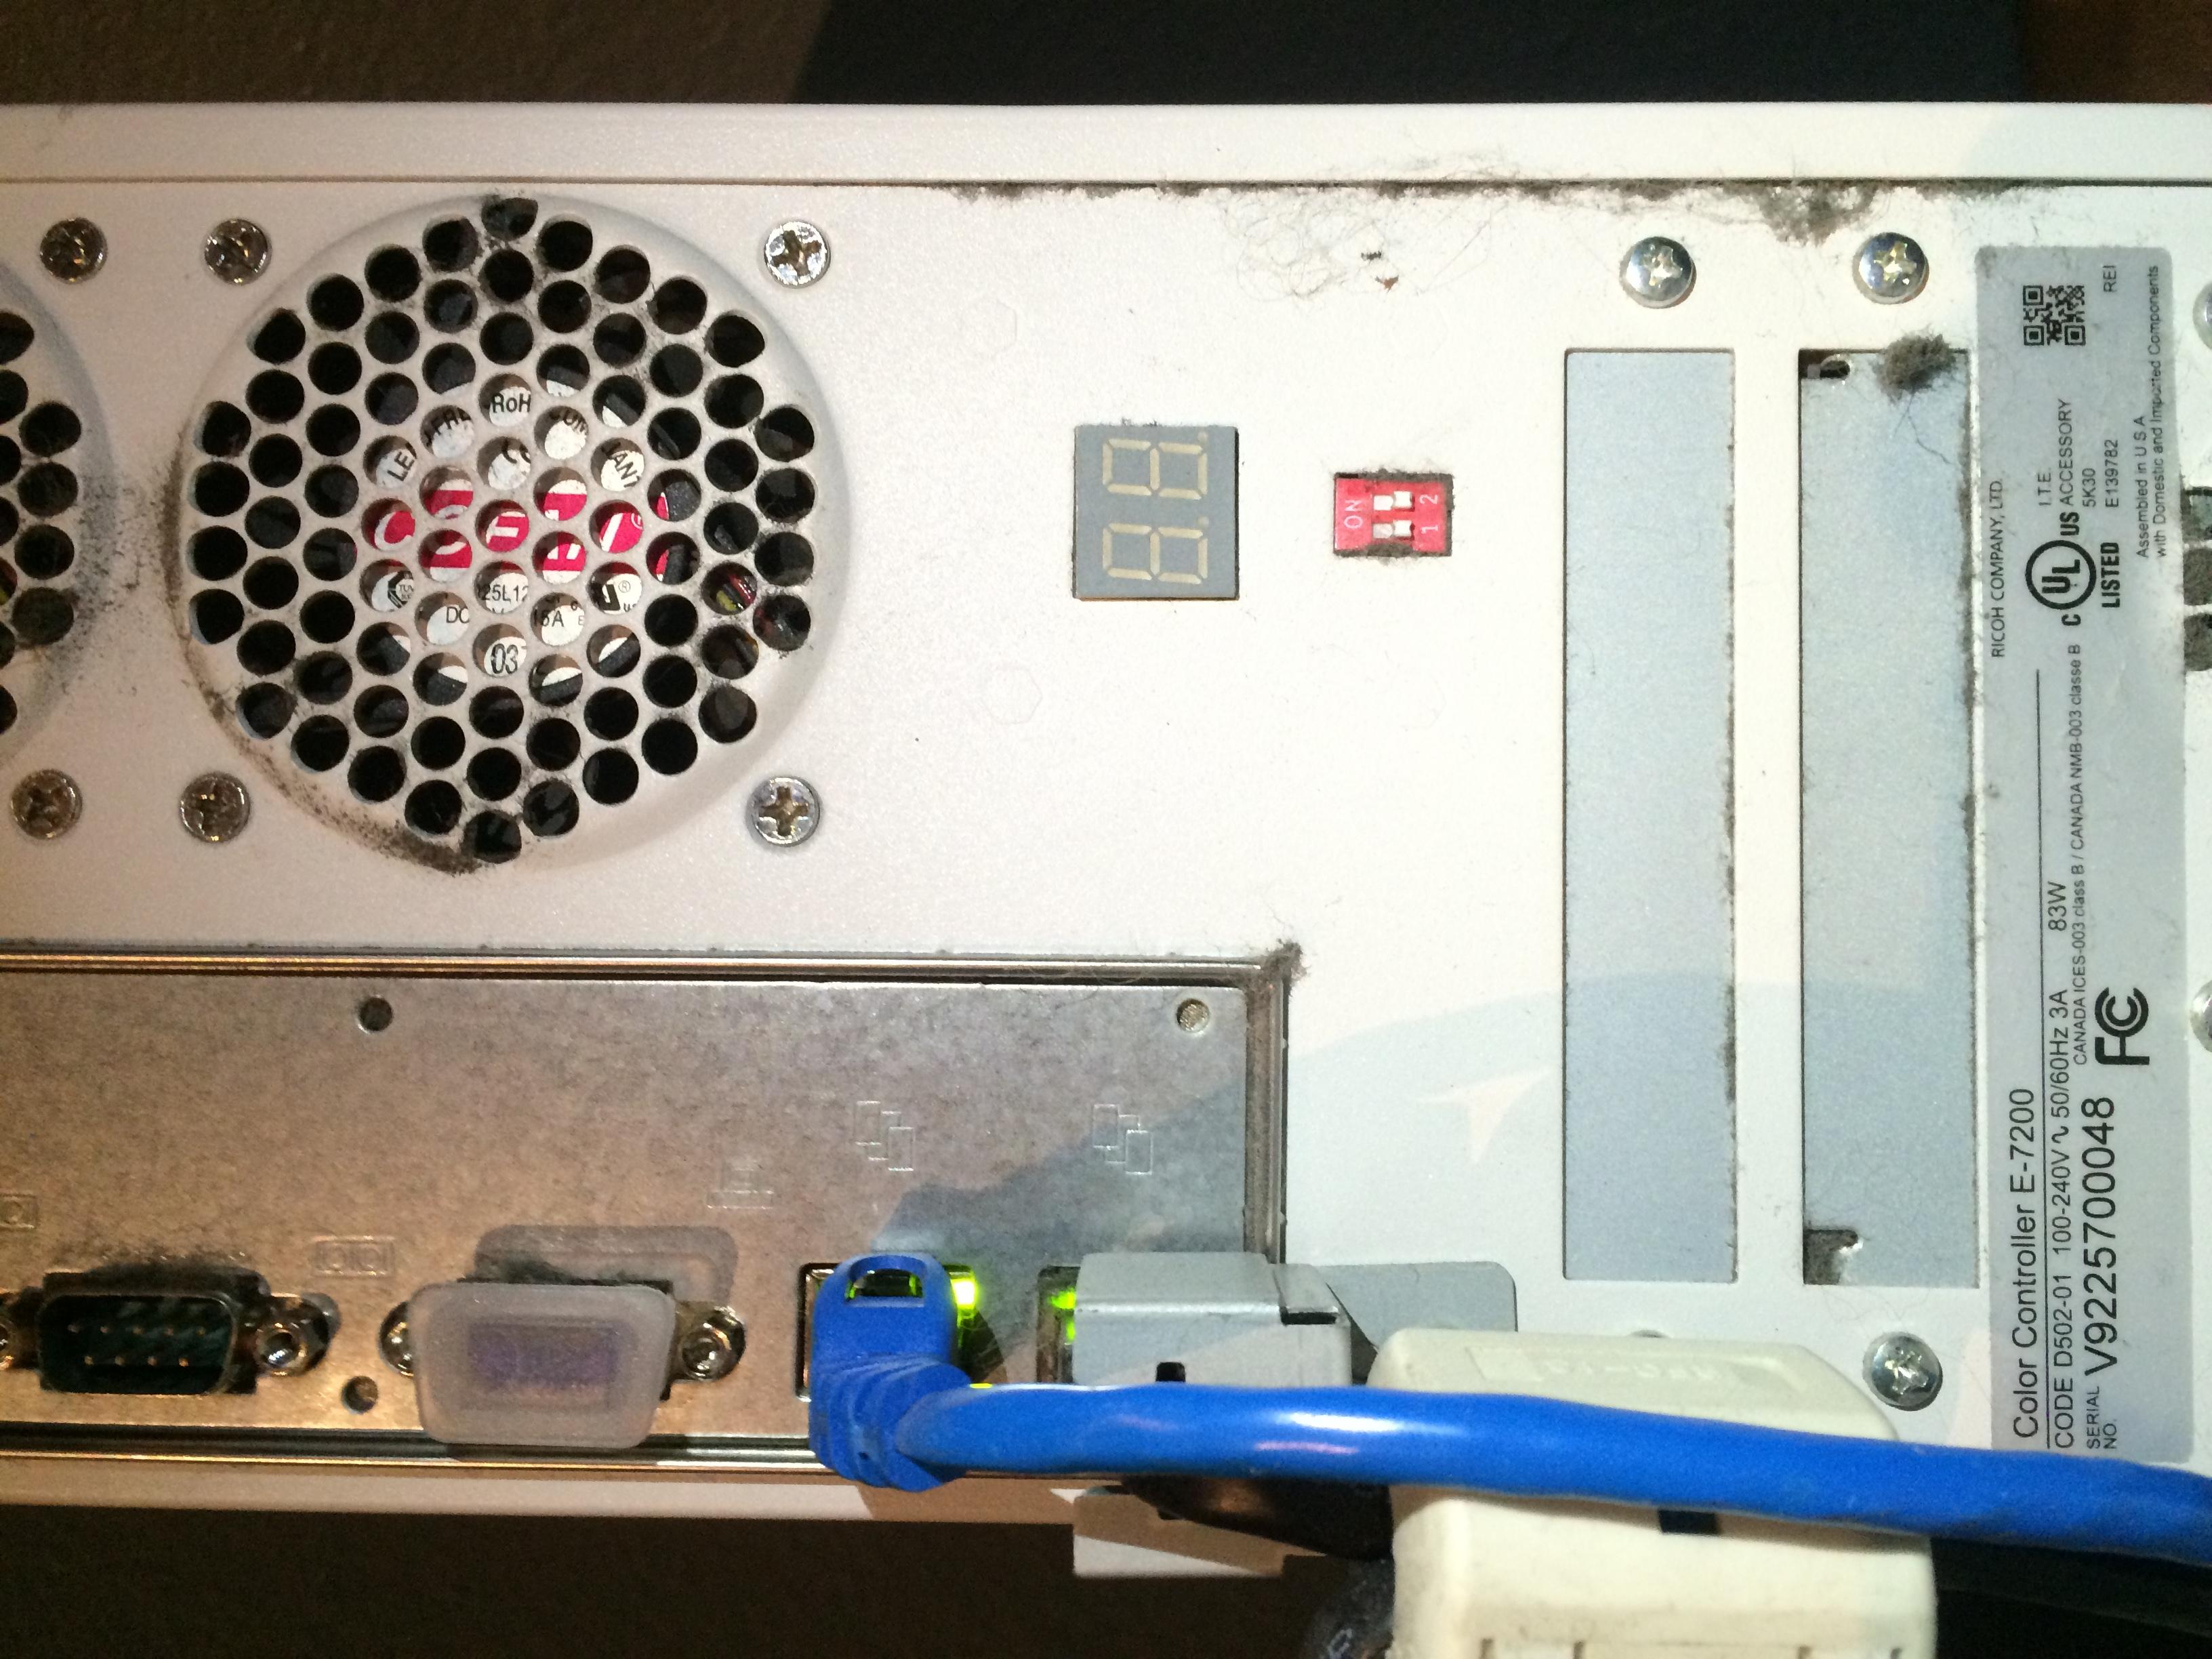 Savin (Ricoh) c9065 printer not printing